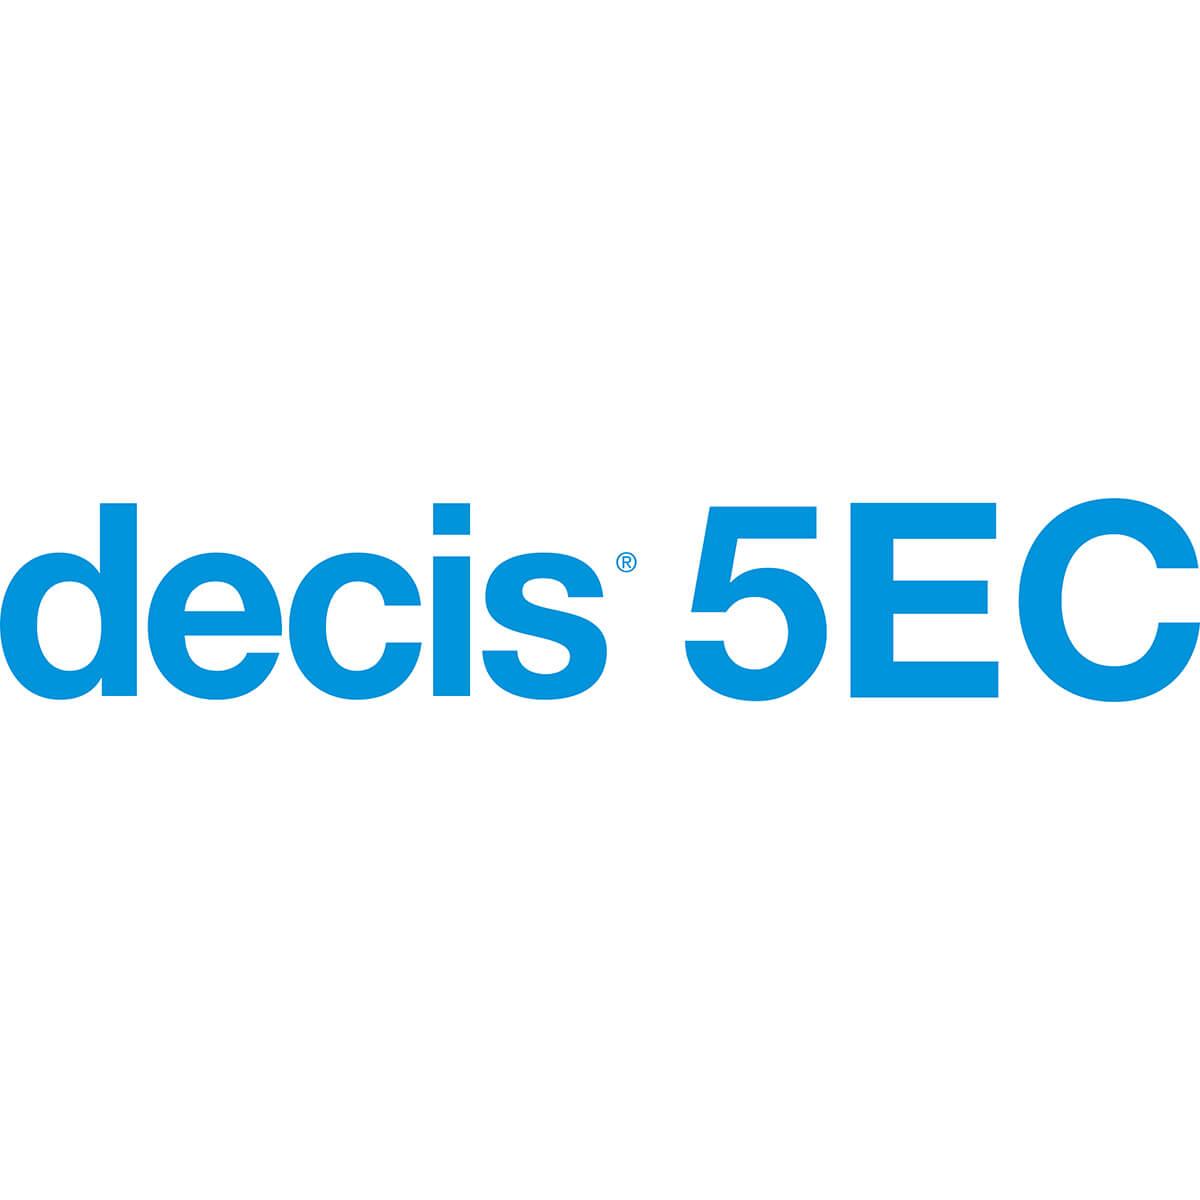 Decis® 9.6L